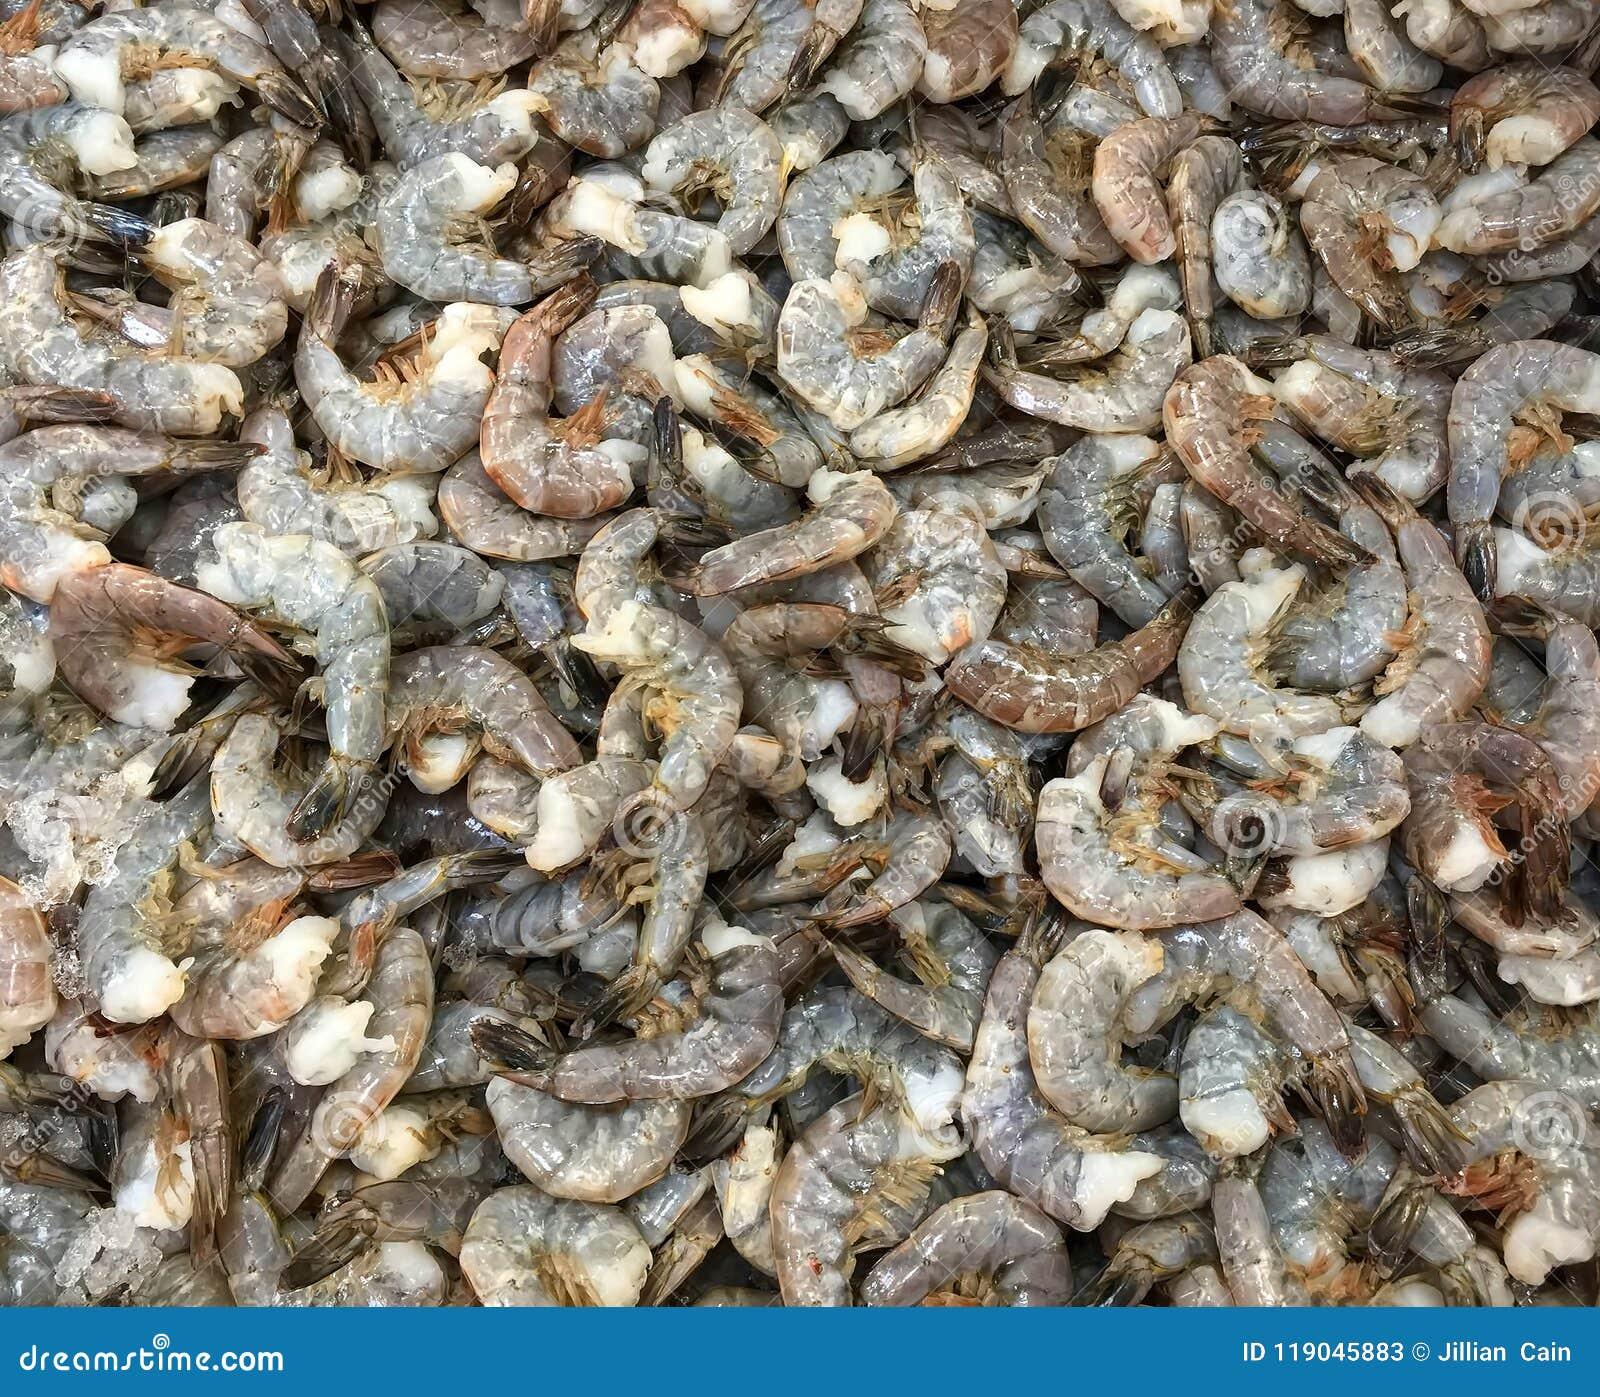 Dozens Of Jumbo Shrimp On Display Stock Image Image Of Crustacean